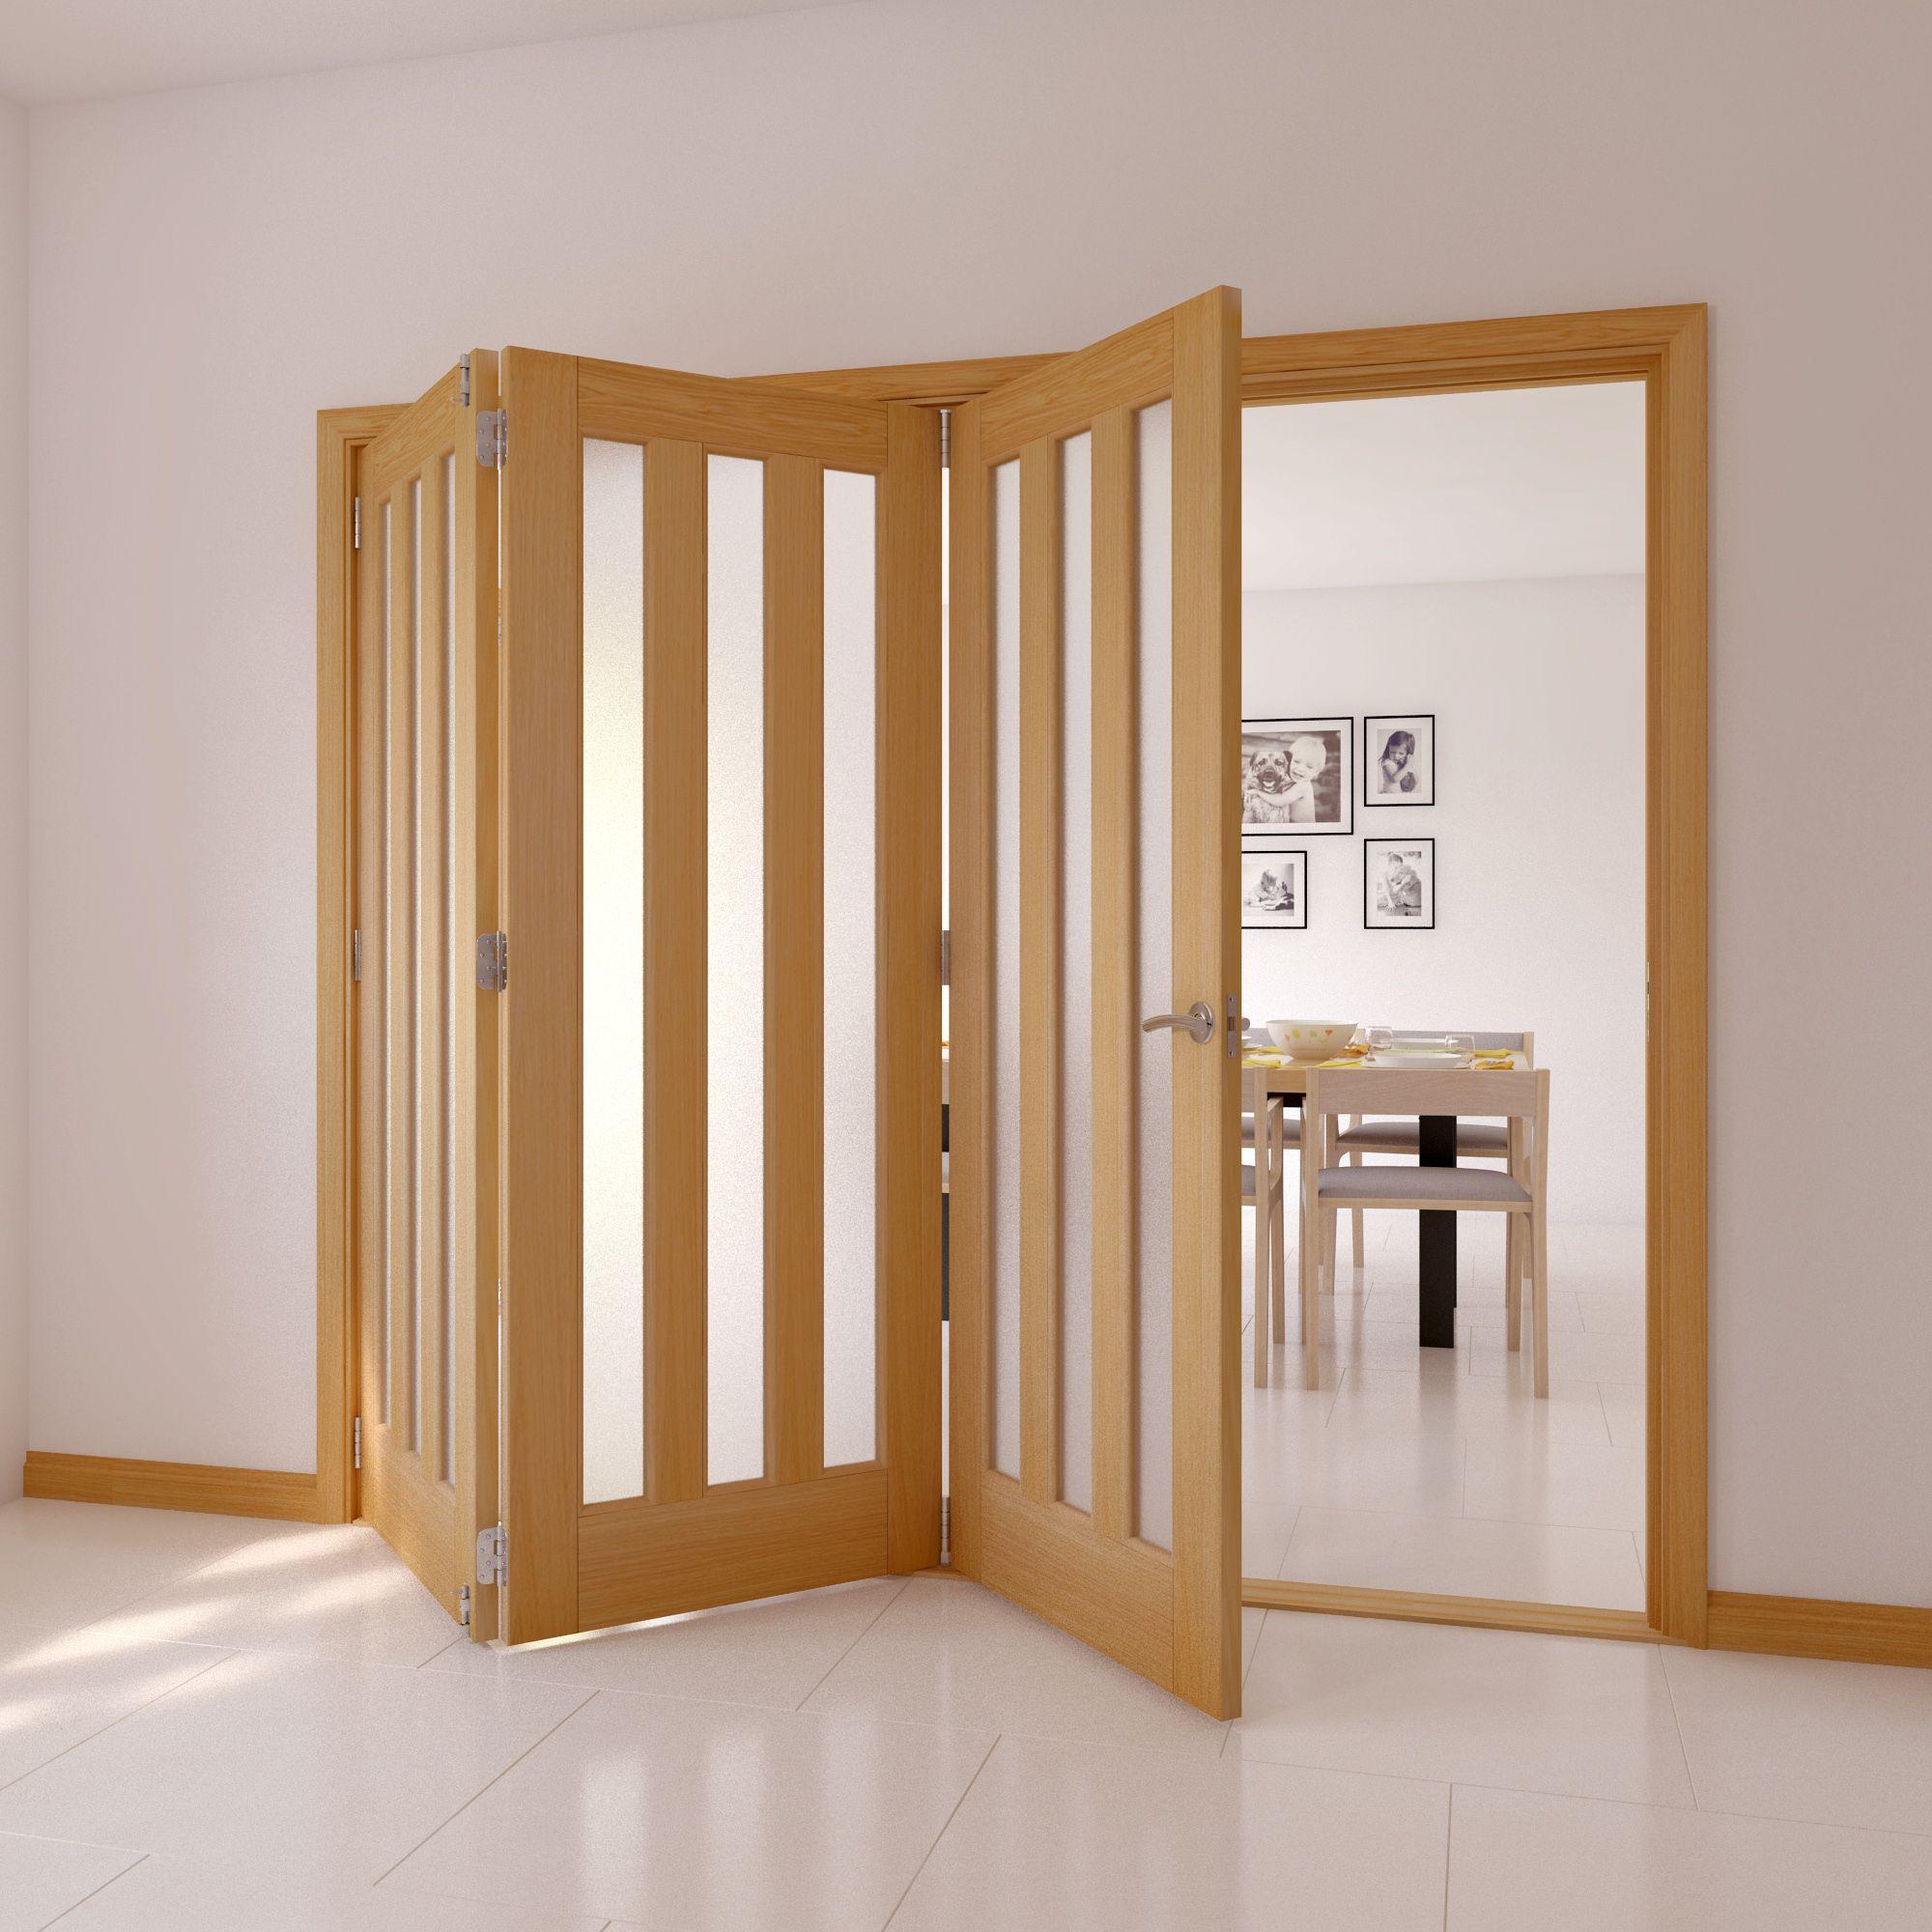 Saxton Vertical 3 Lite Oak Veneer Glazed Internal Folding Door Lh, (h)2035mm (w)2374mm